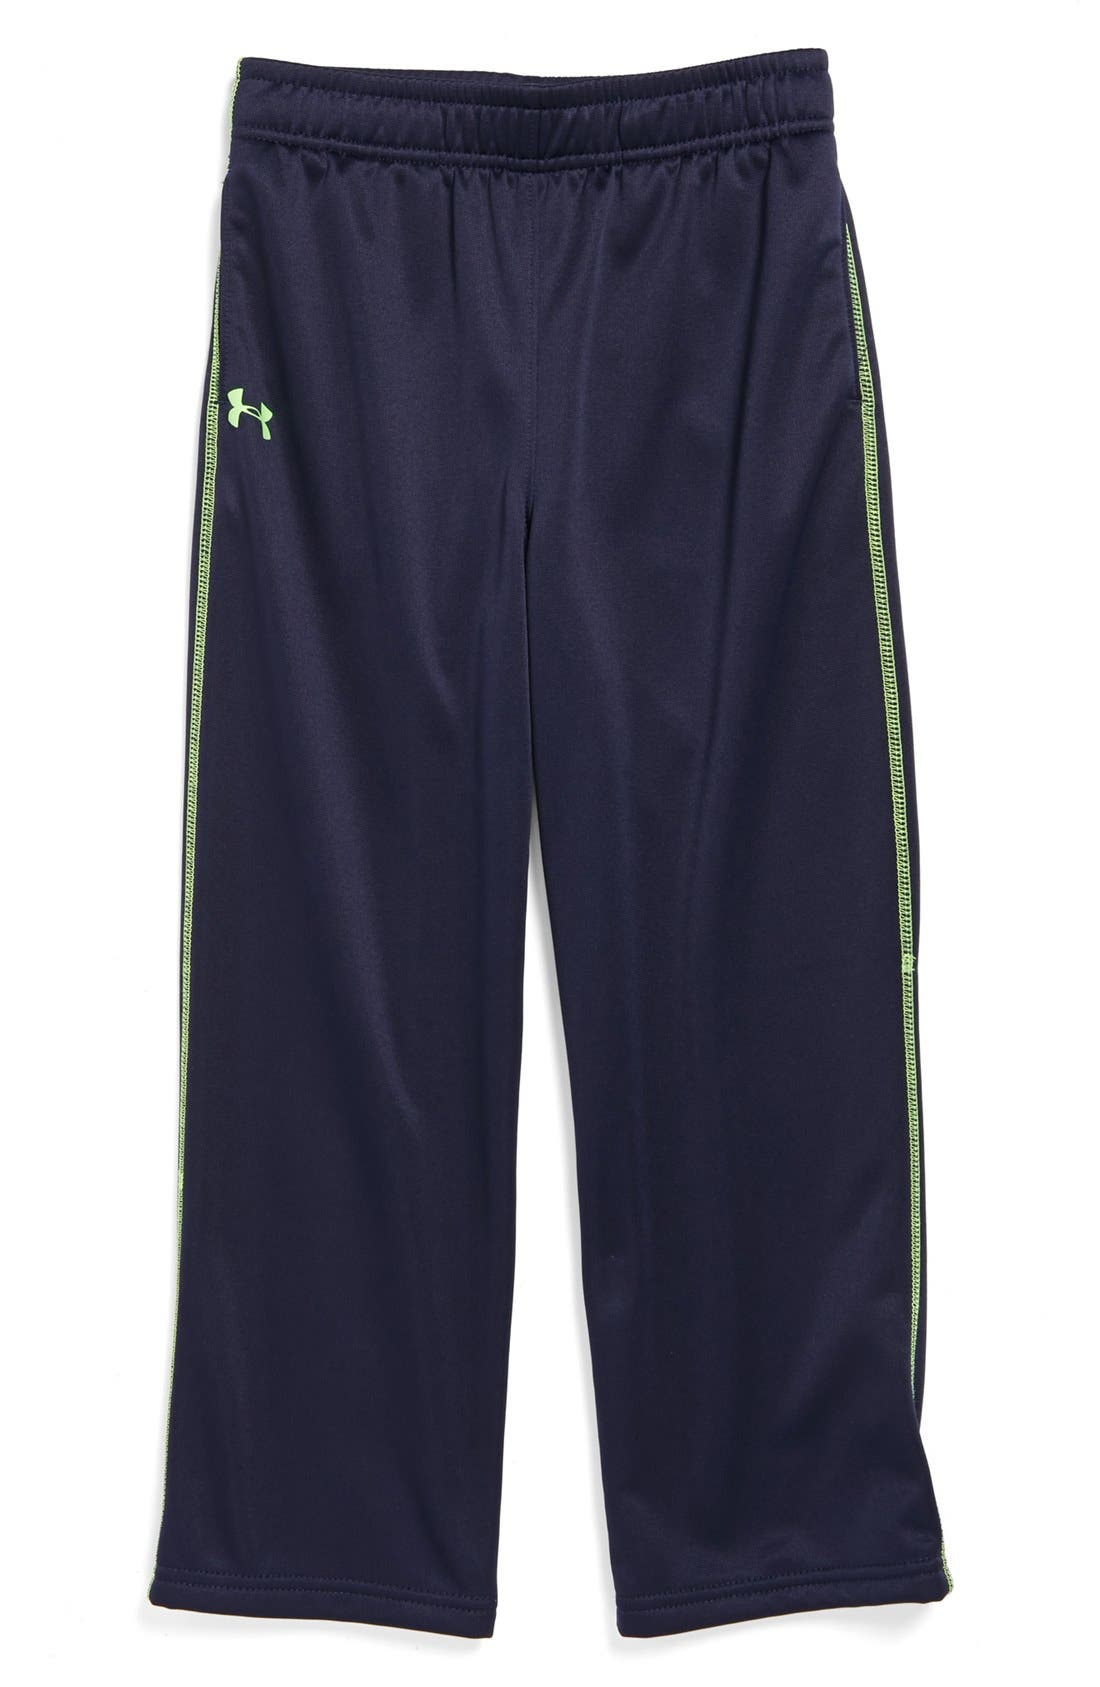 Alternate Image 1 Selected - Under Armour Fleece Lined AllSeasonGear® Pants (Little Boys)